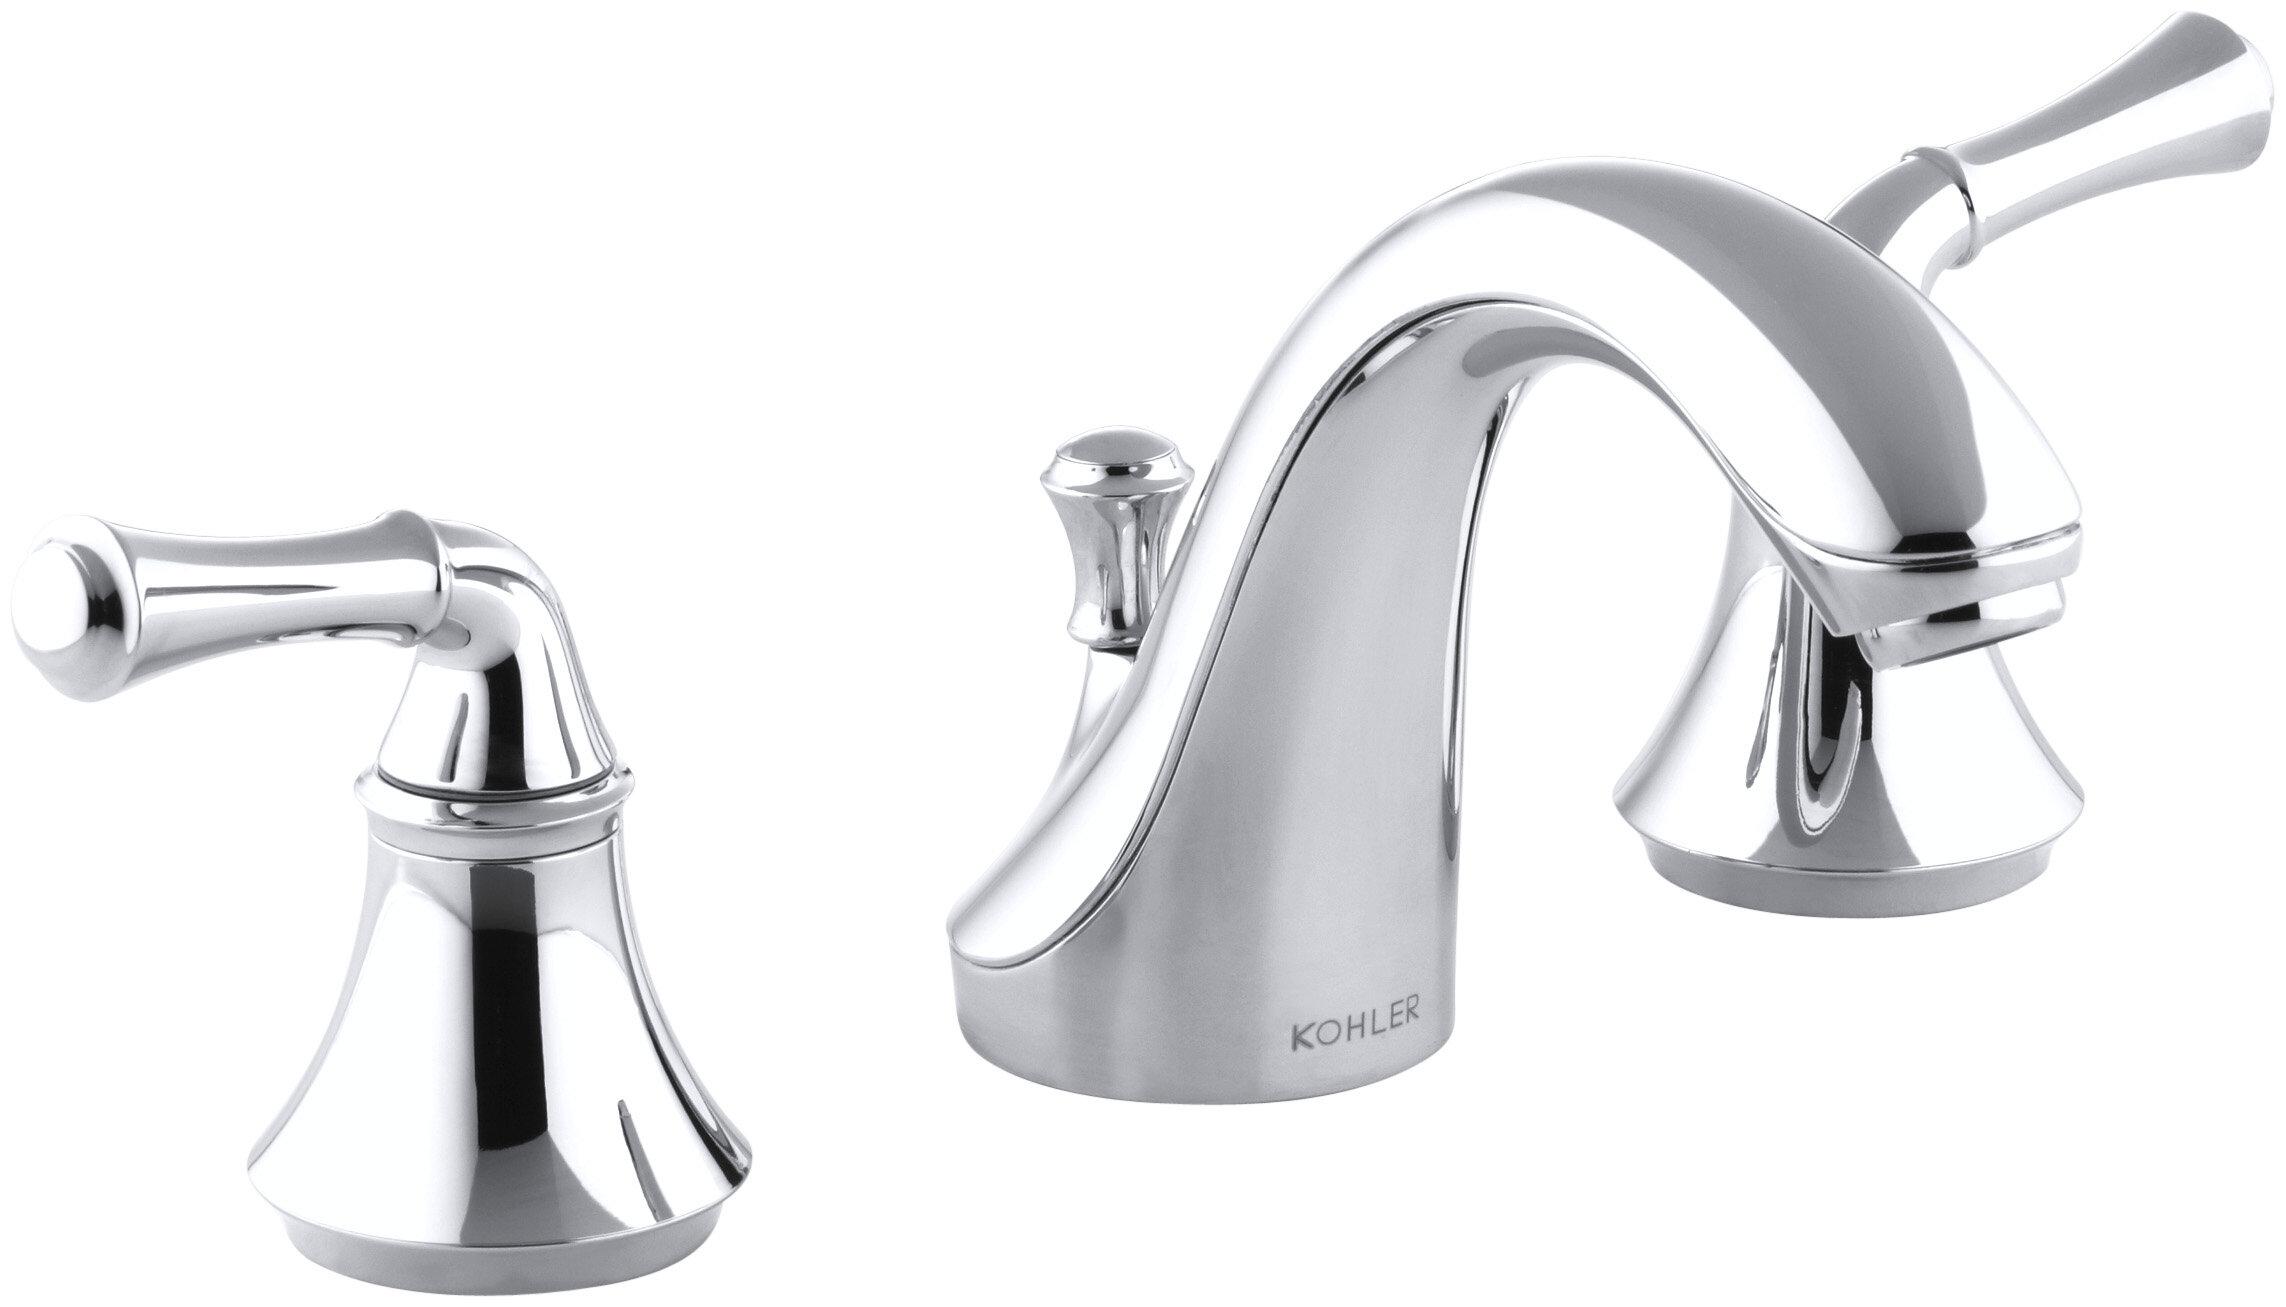 standard bathroom k sushi faucet ege kelston product kohler cp com faucets supply sink plumbing